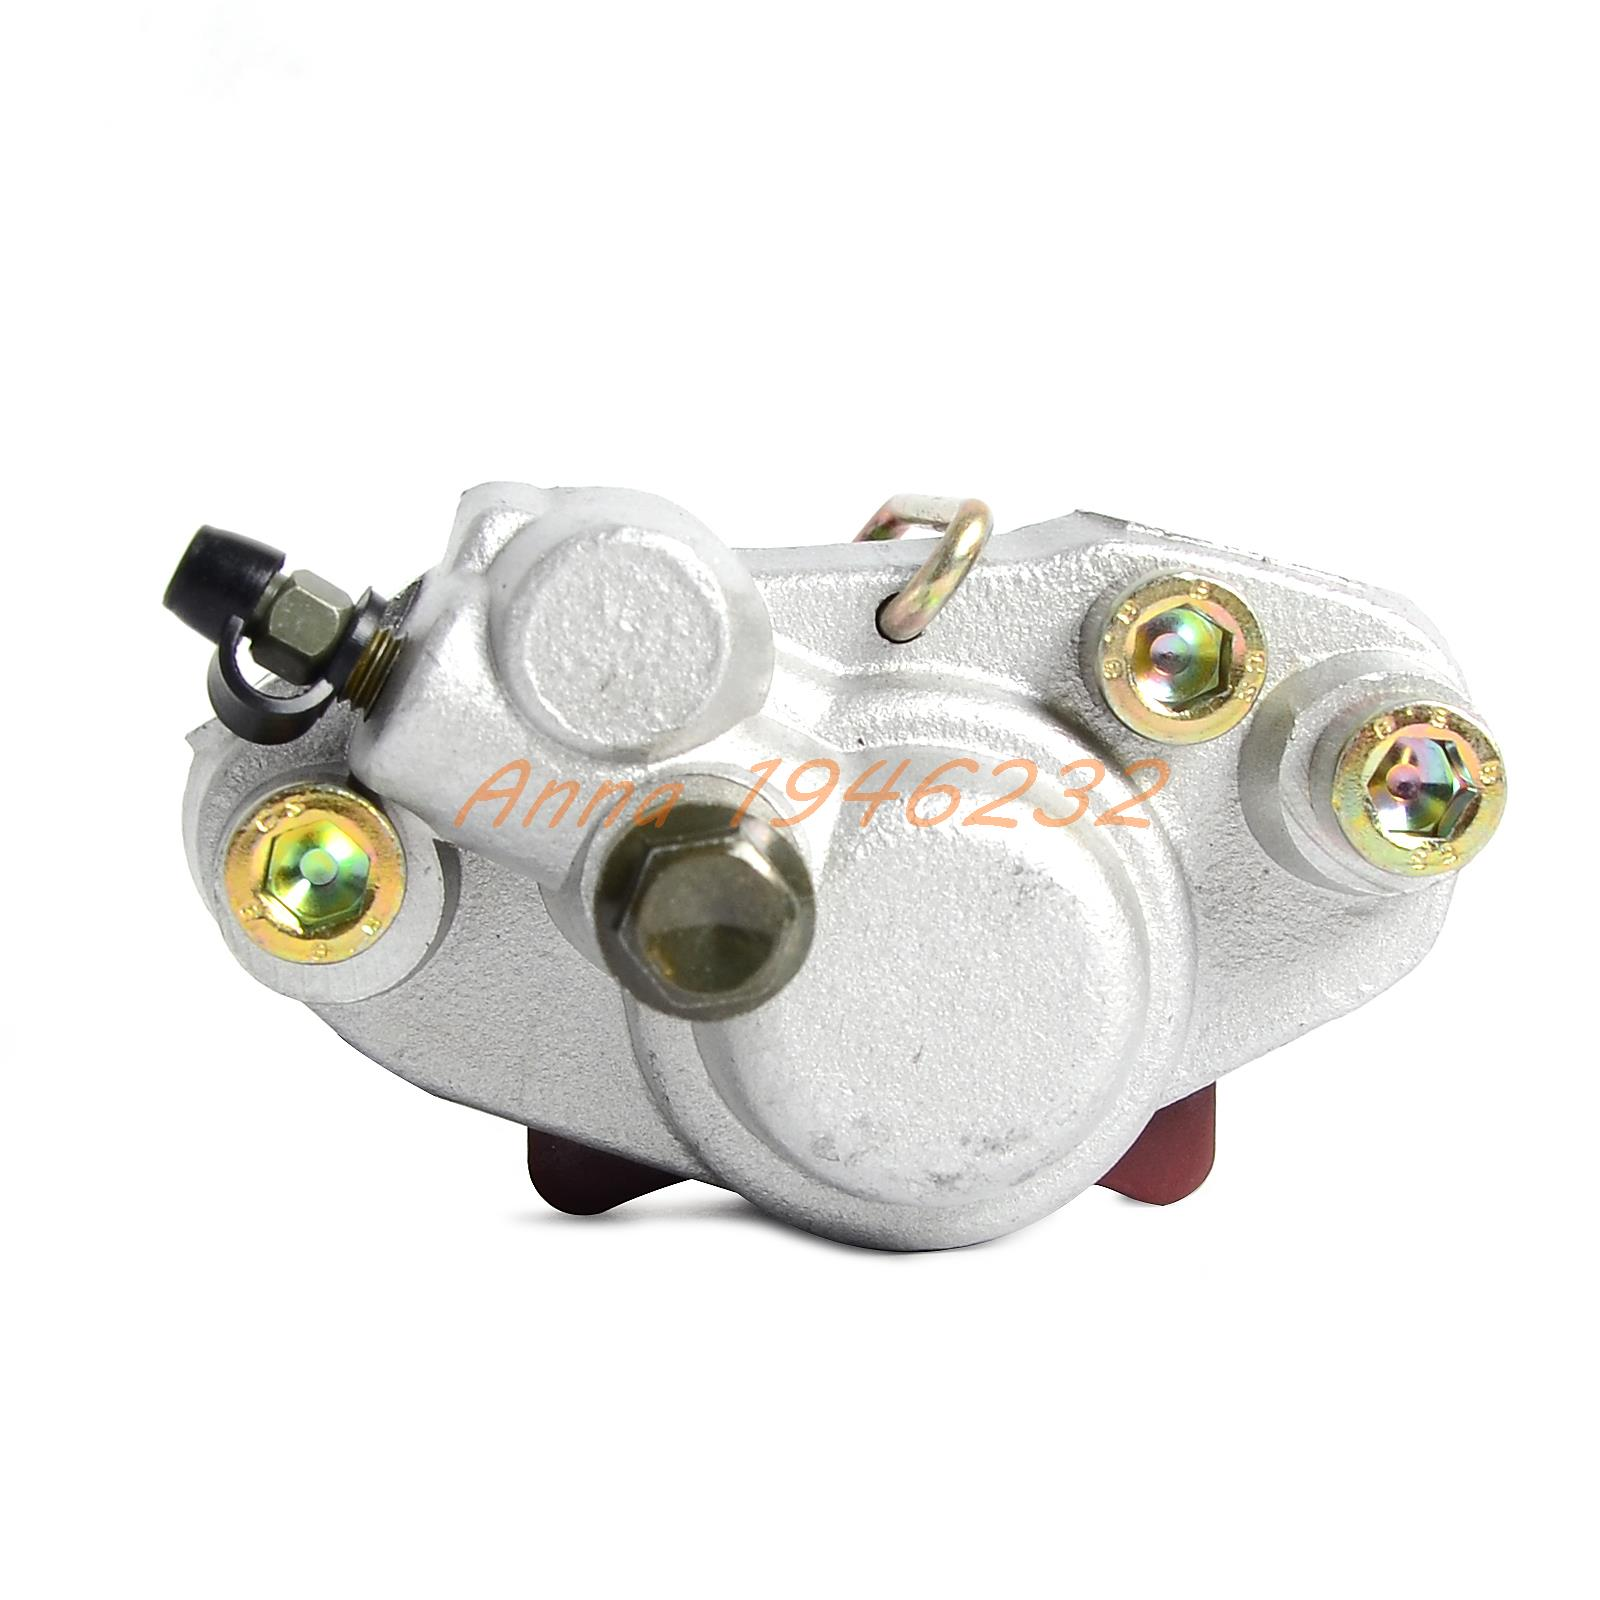 Manco 260 Wiring Diagram 4x4 Suspension Tires Scorpion Go Kart Transmission For Talon 300 Atv Linhai 8260 Lh260atv Rear Ke On